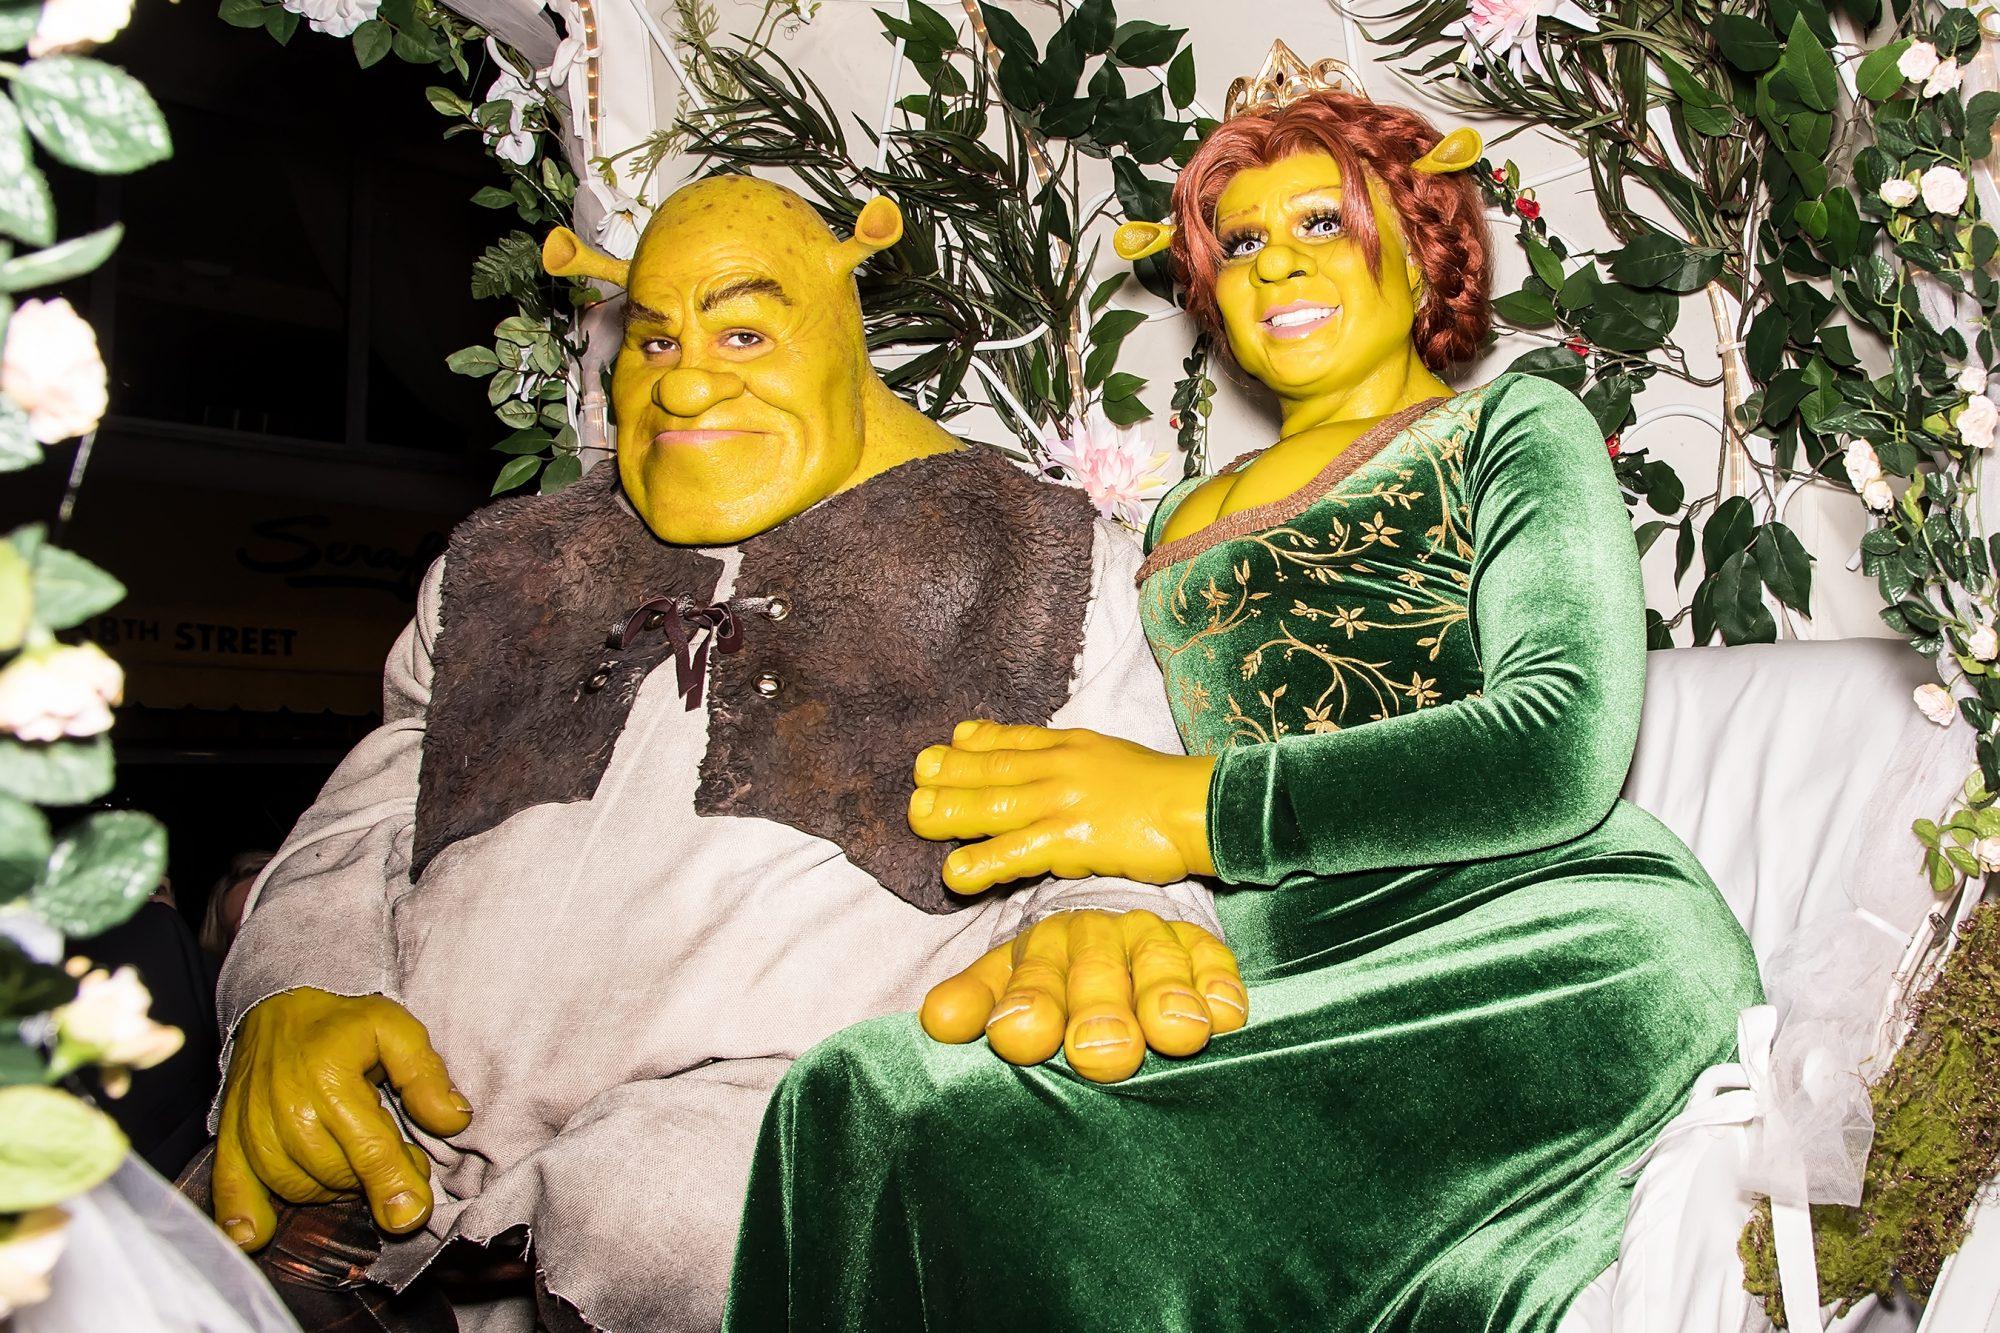 Heidi Klum Wins Halloween With Shrek And Fiona Couples Costume Ew Com